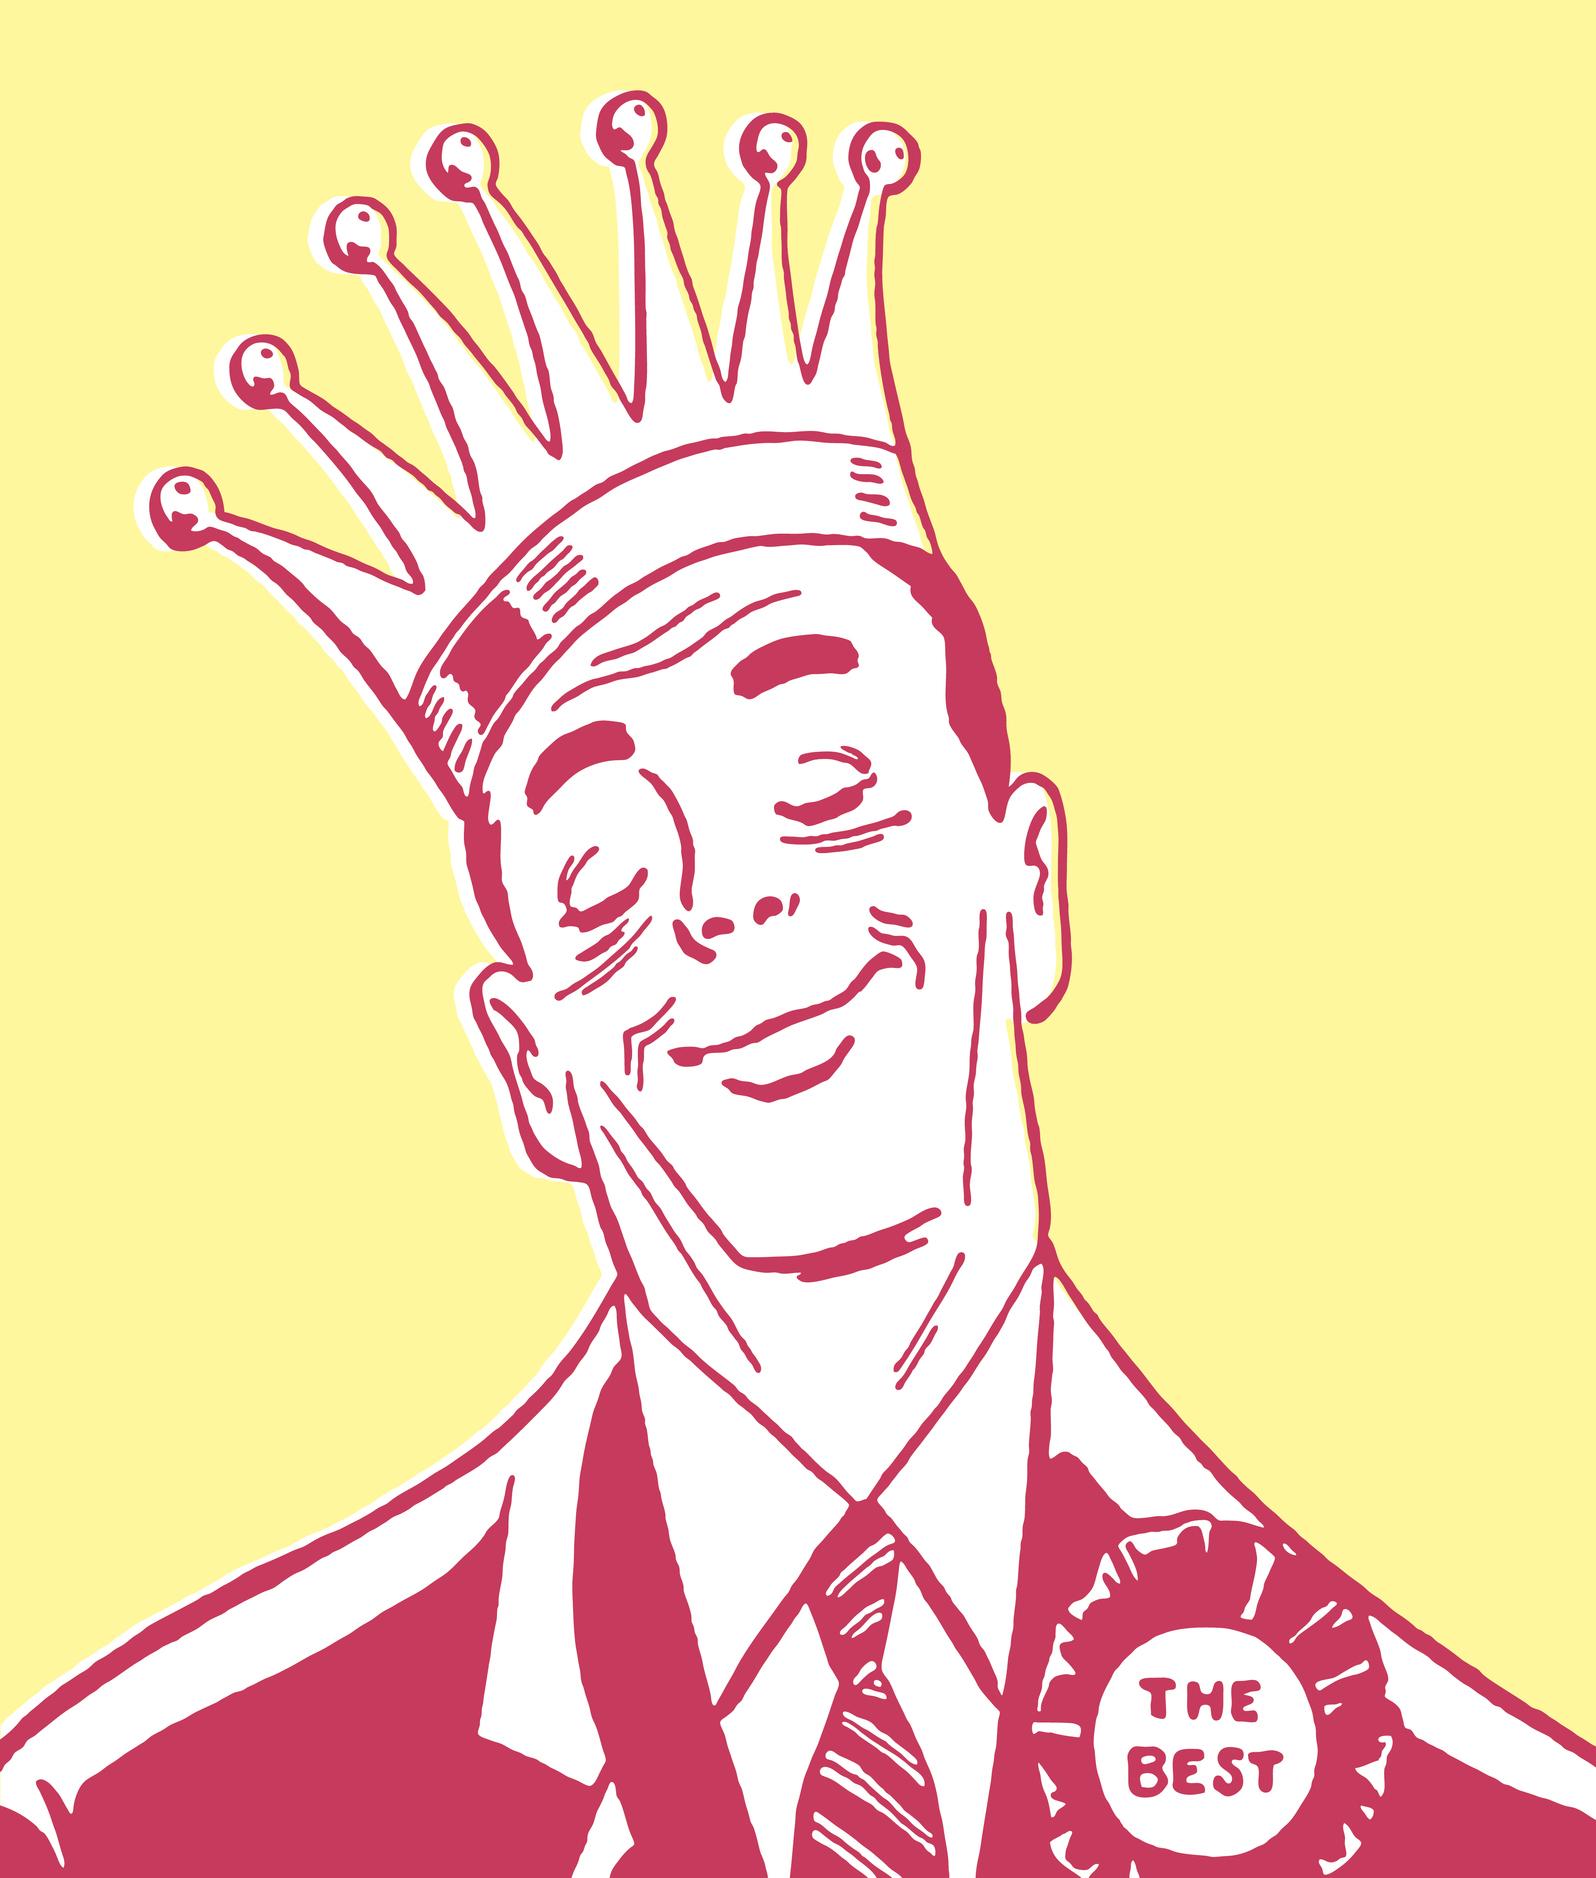 Vintage man with crown on head illustration.